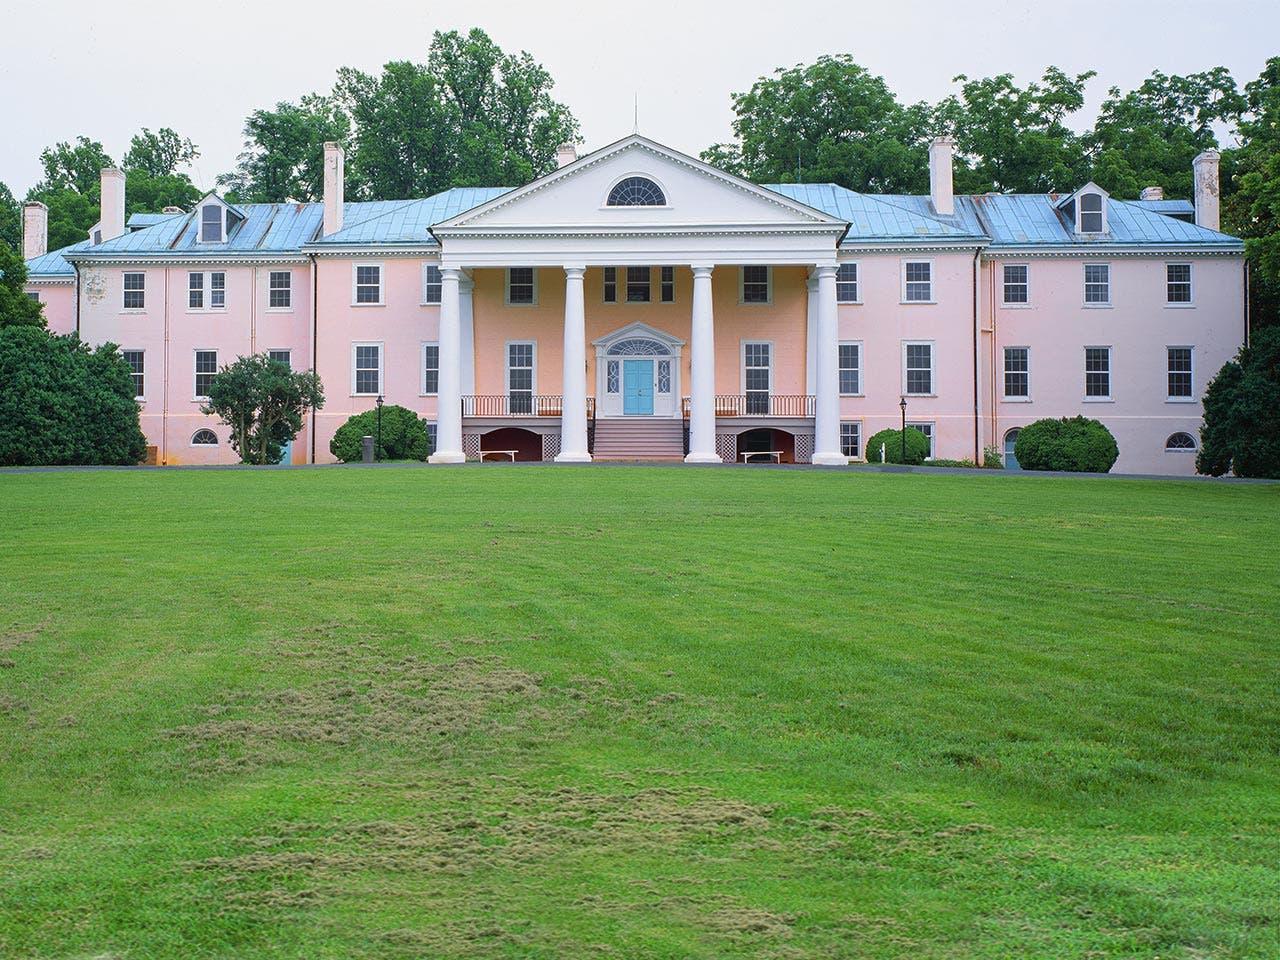 House of James Madison | Joseph Sohm/Shutterstock.com